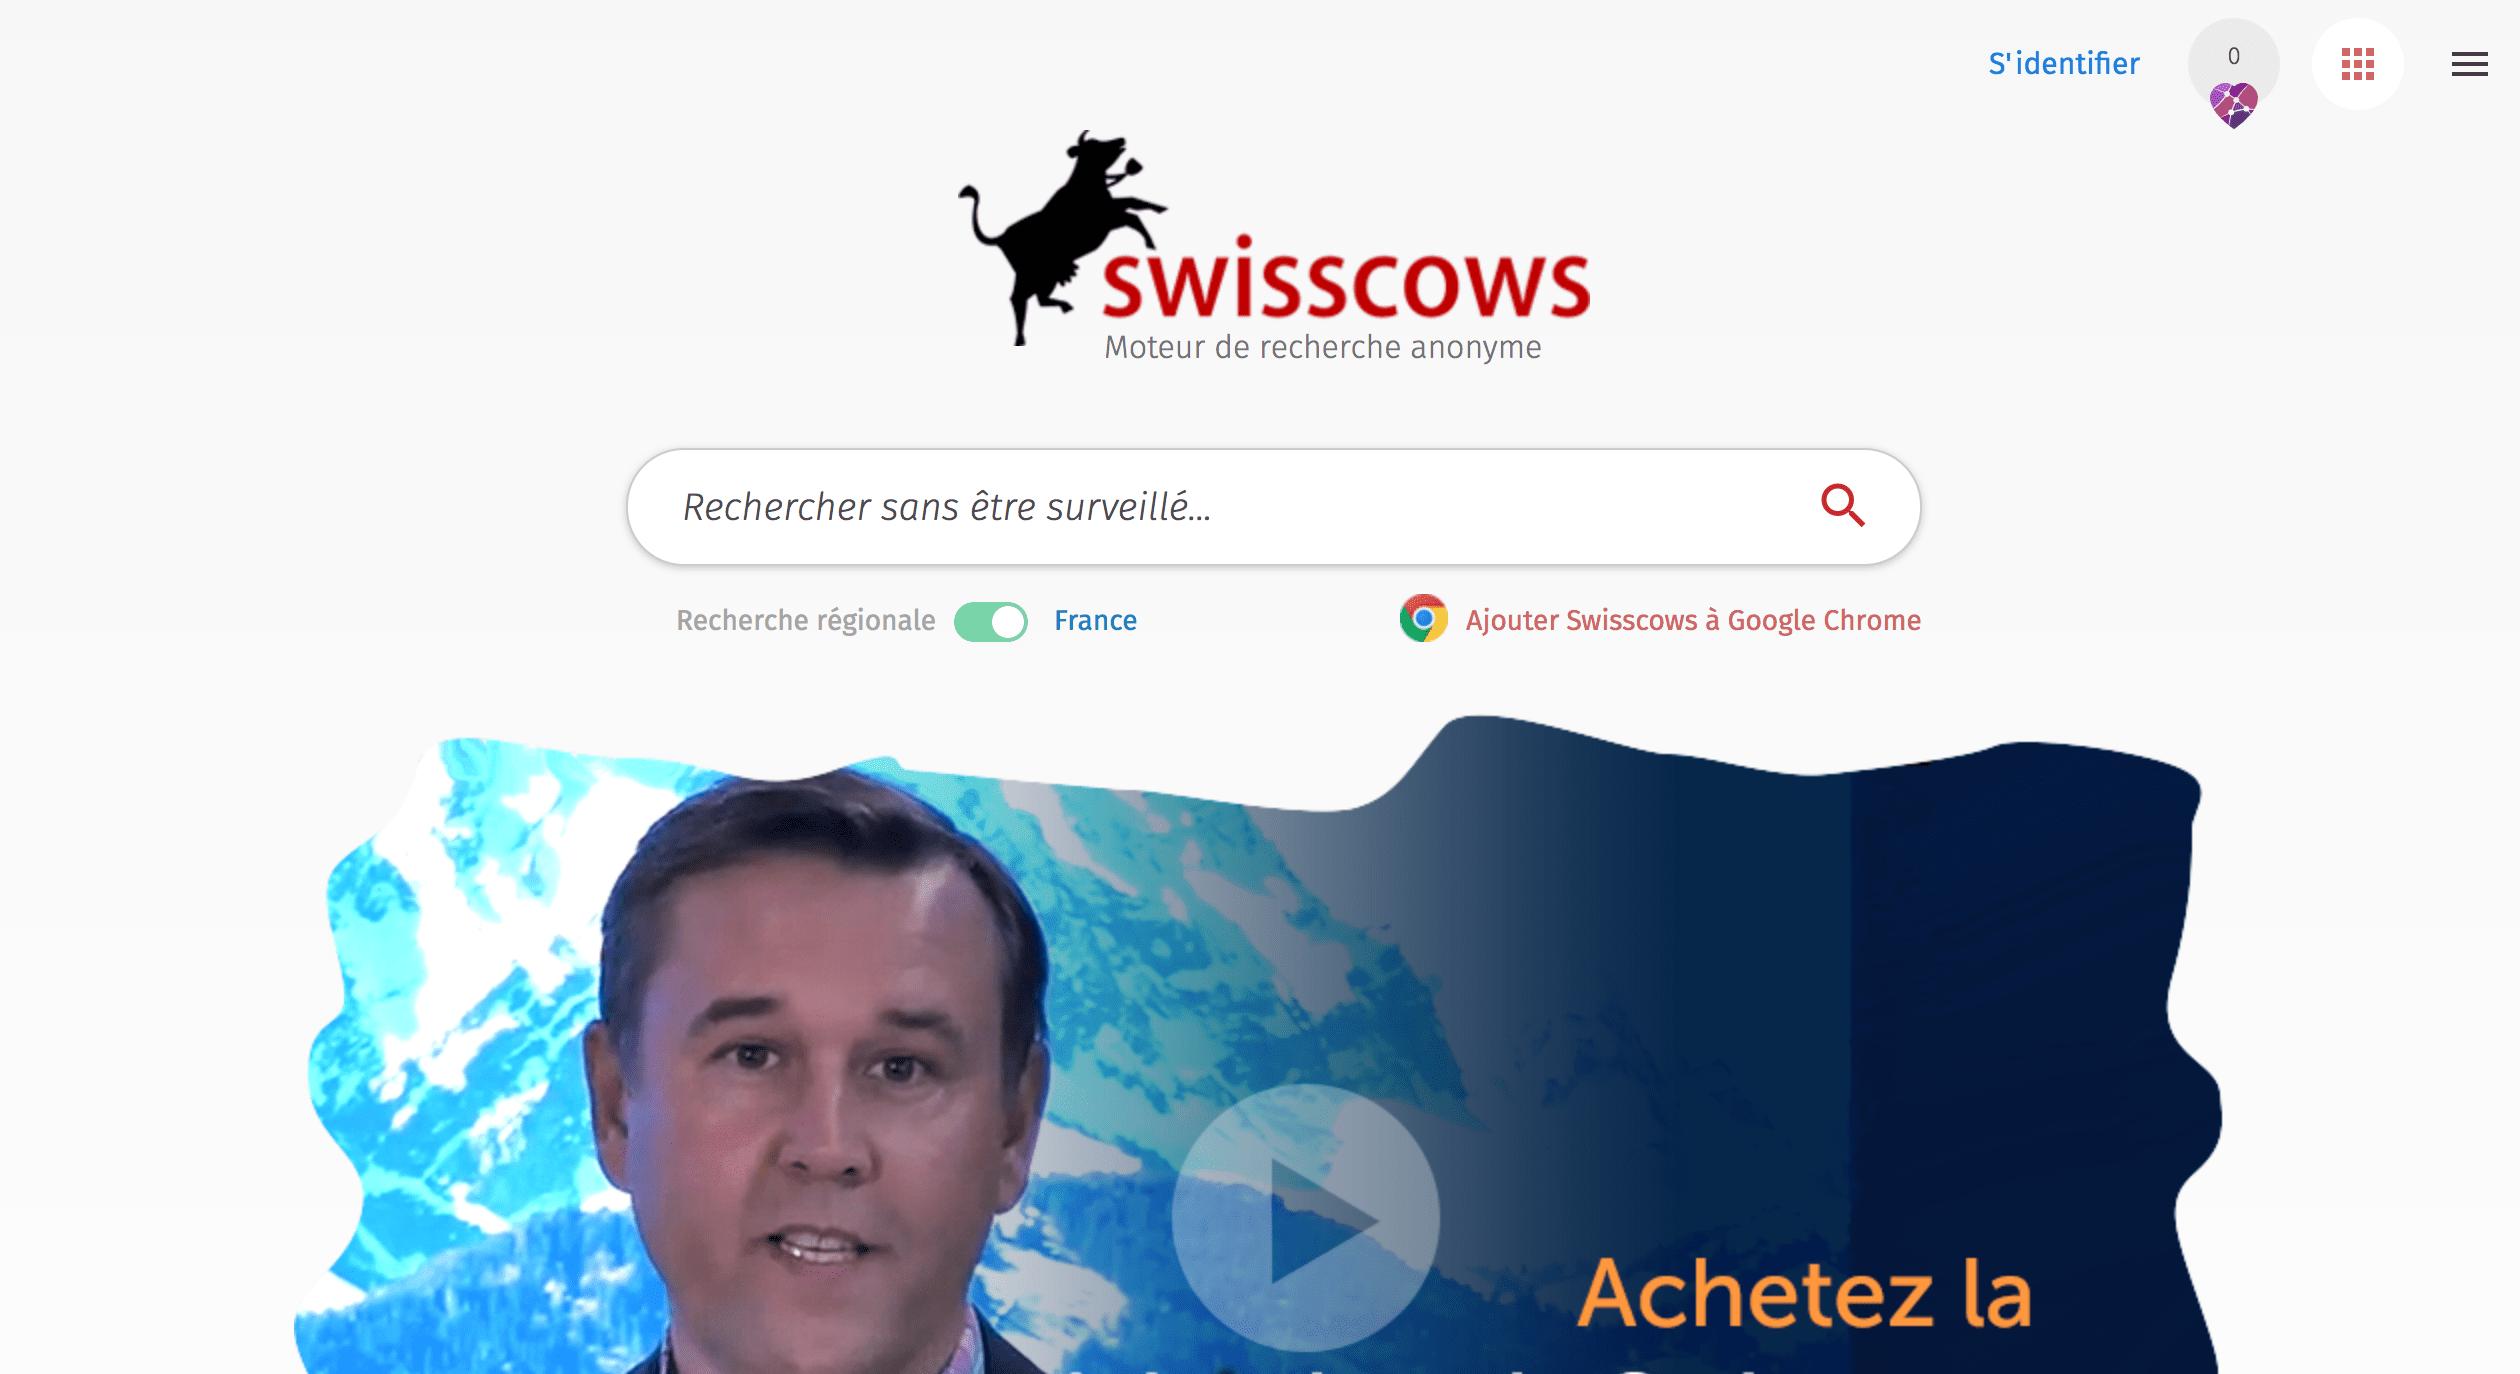 Swisscows moteur de recherche